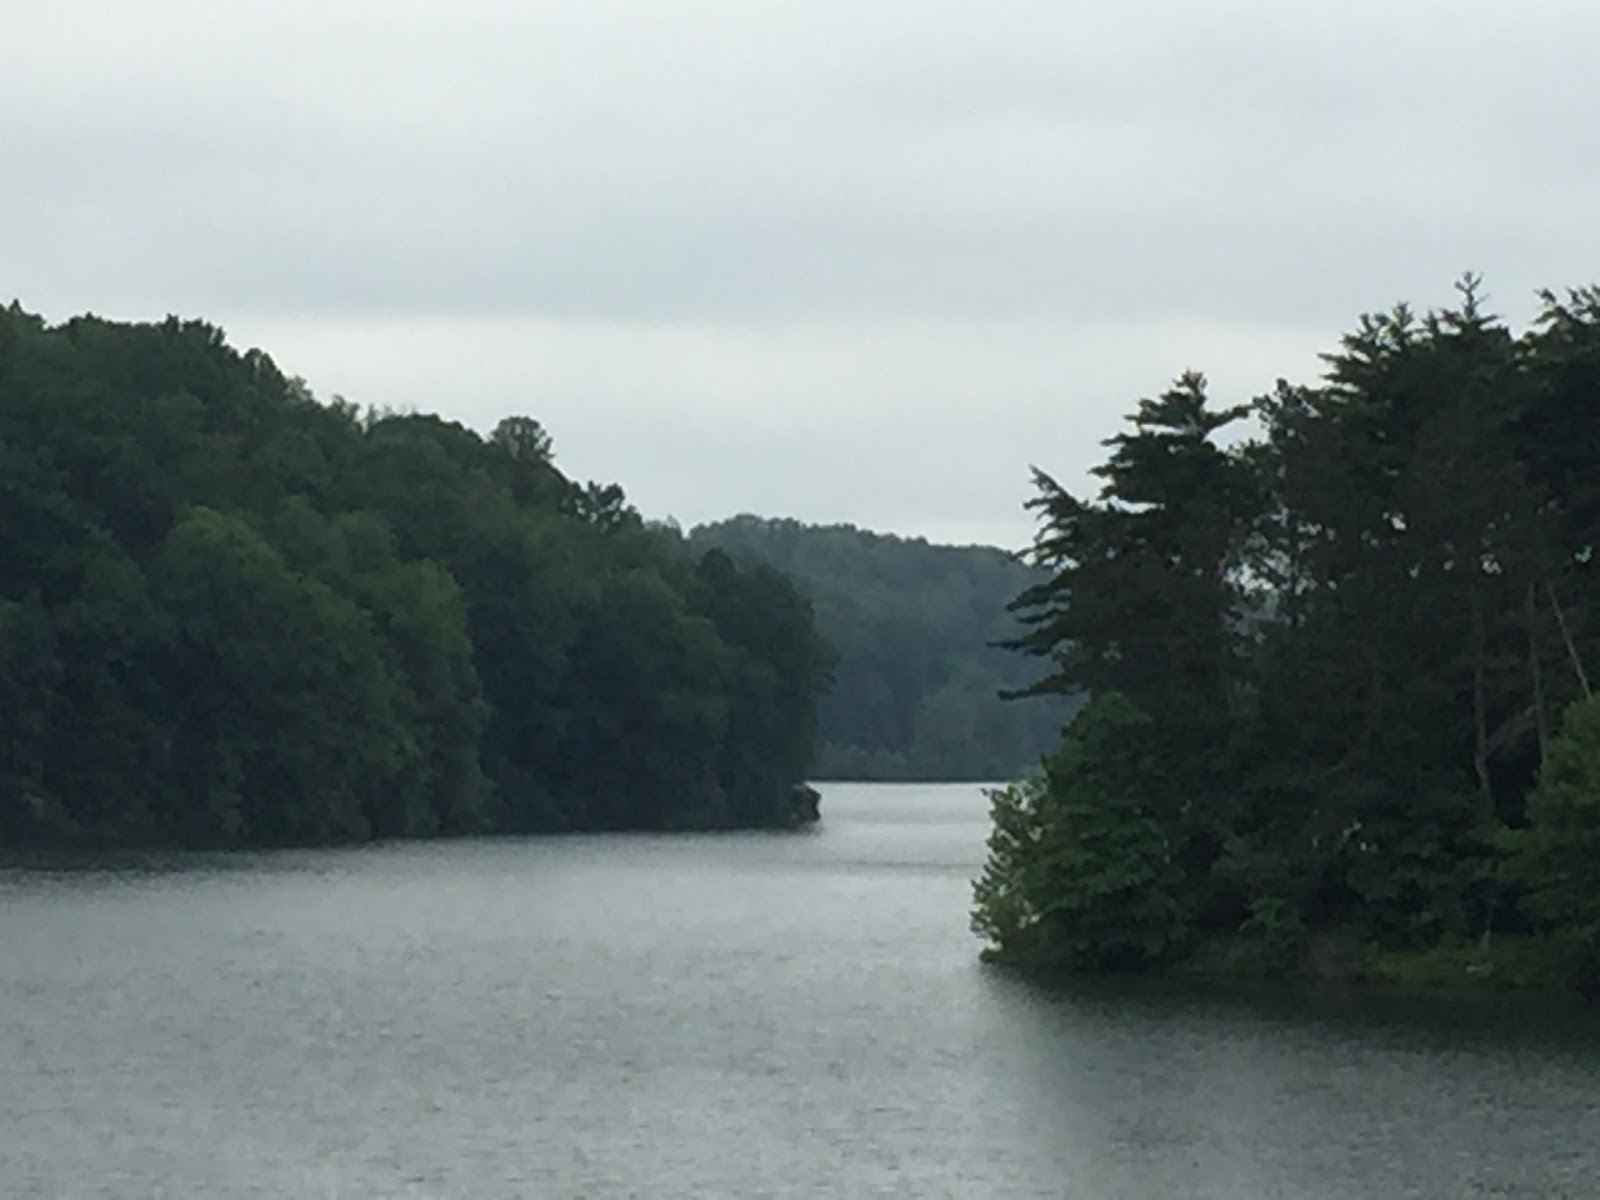 Kayaking Across Ohio Clendening Lake Wisteria Wisteria